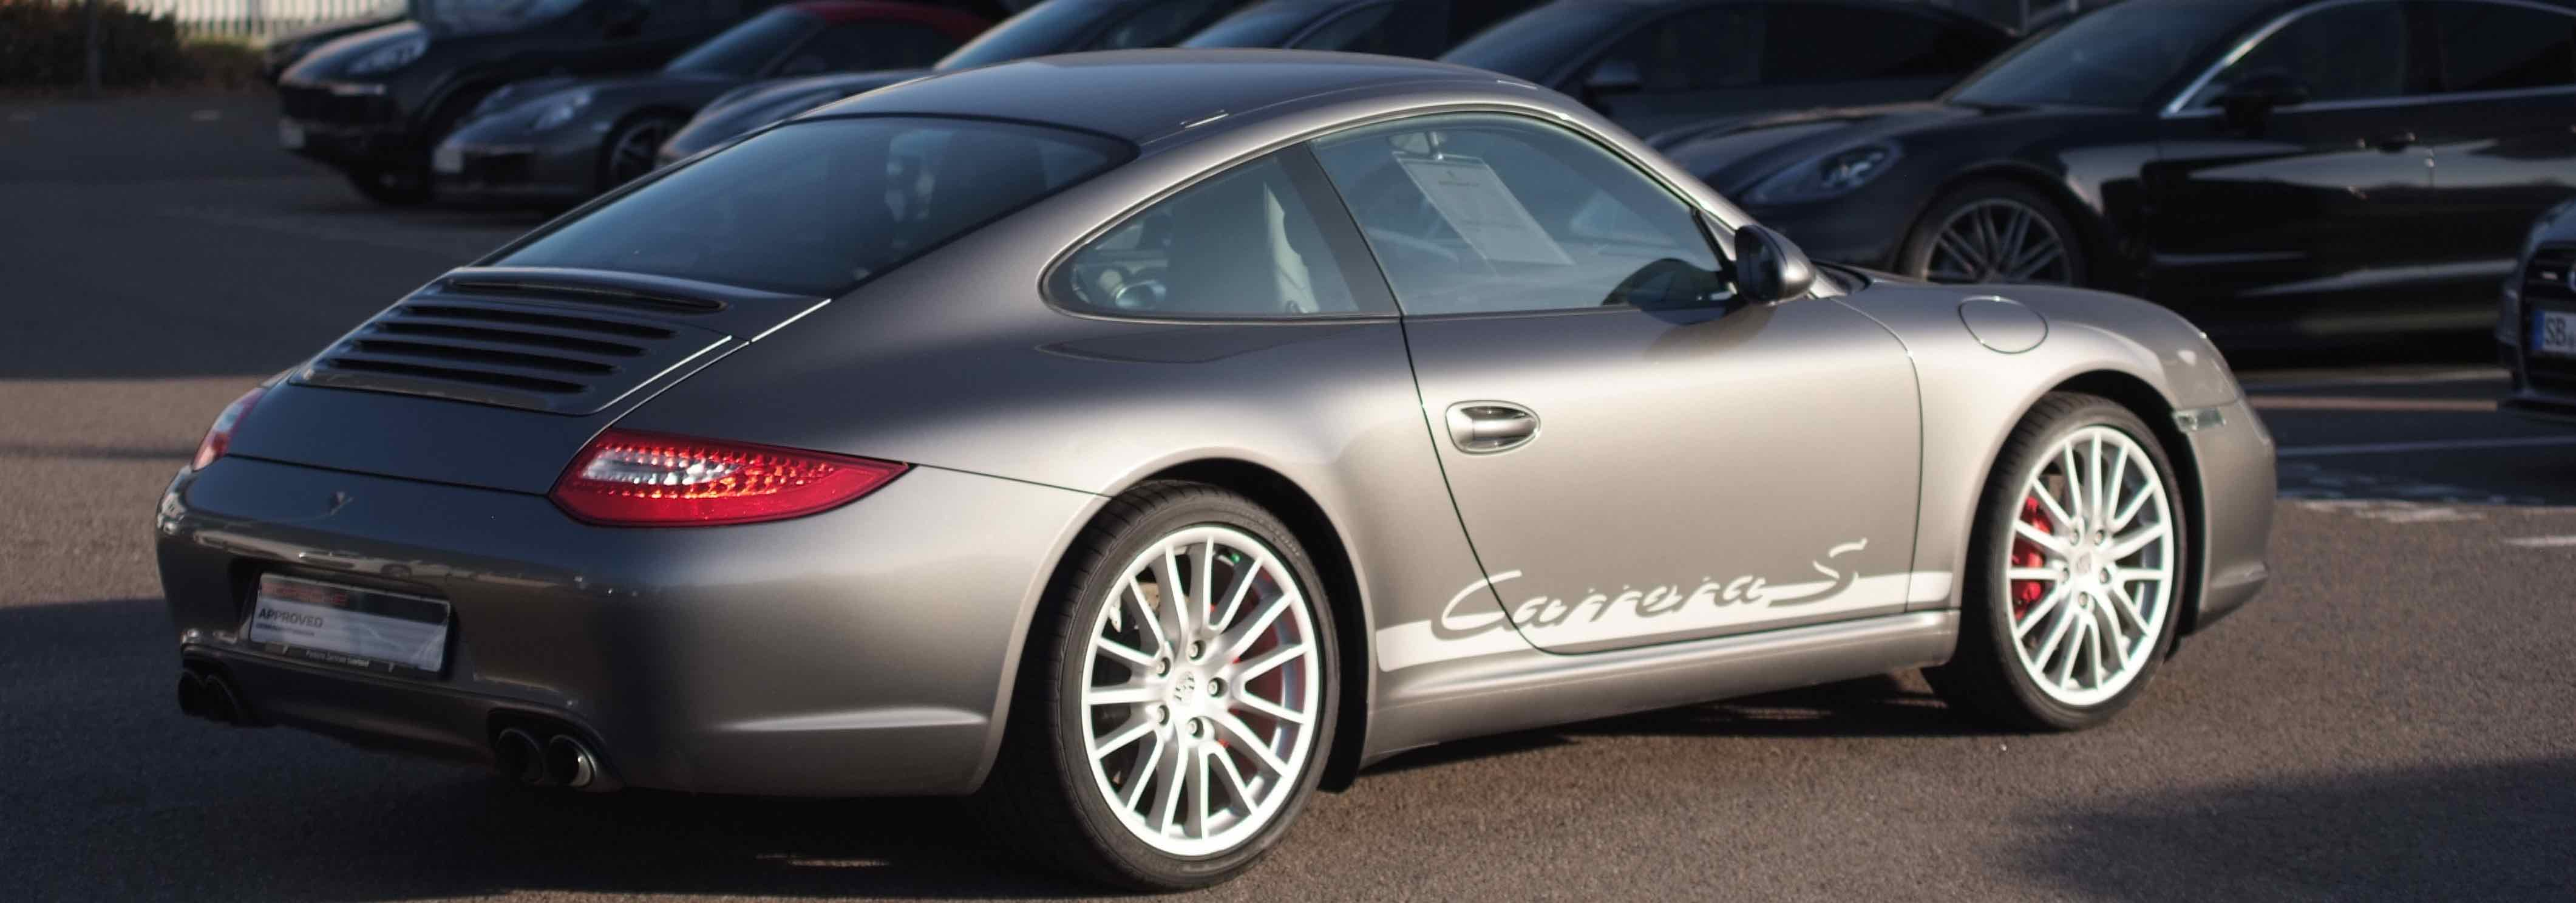 Porsche occasion Stuttgart Automobile